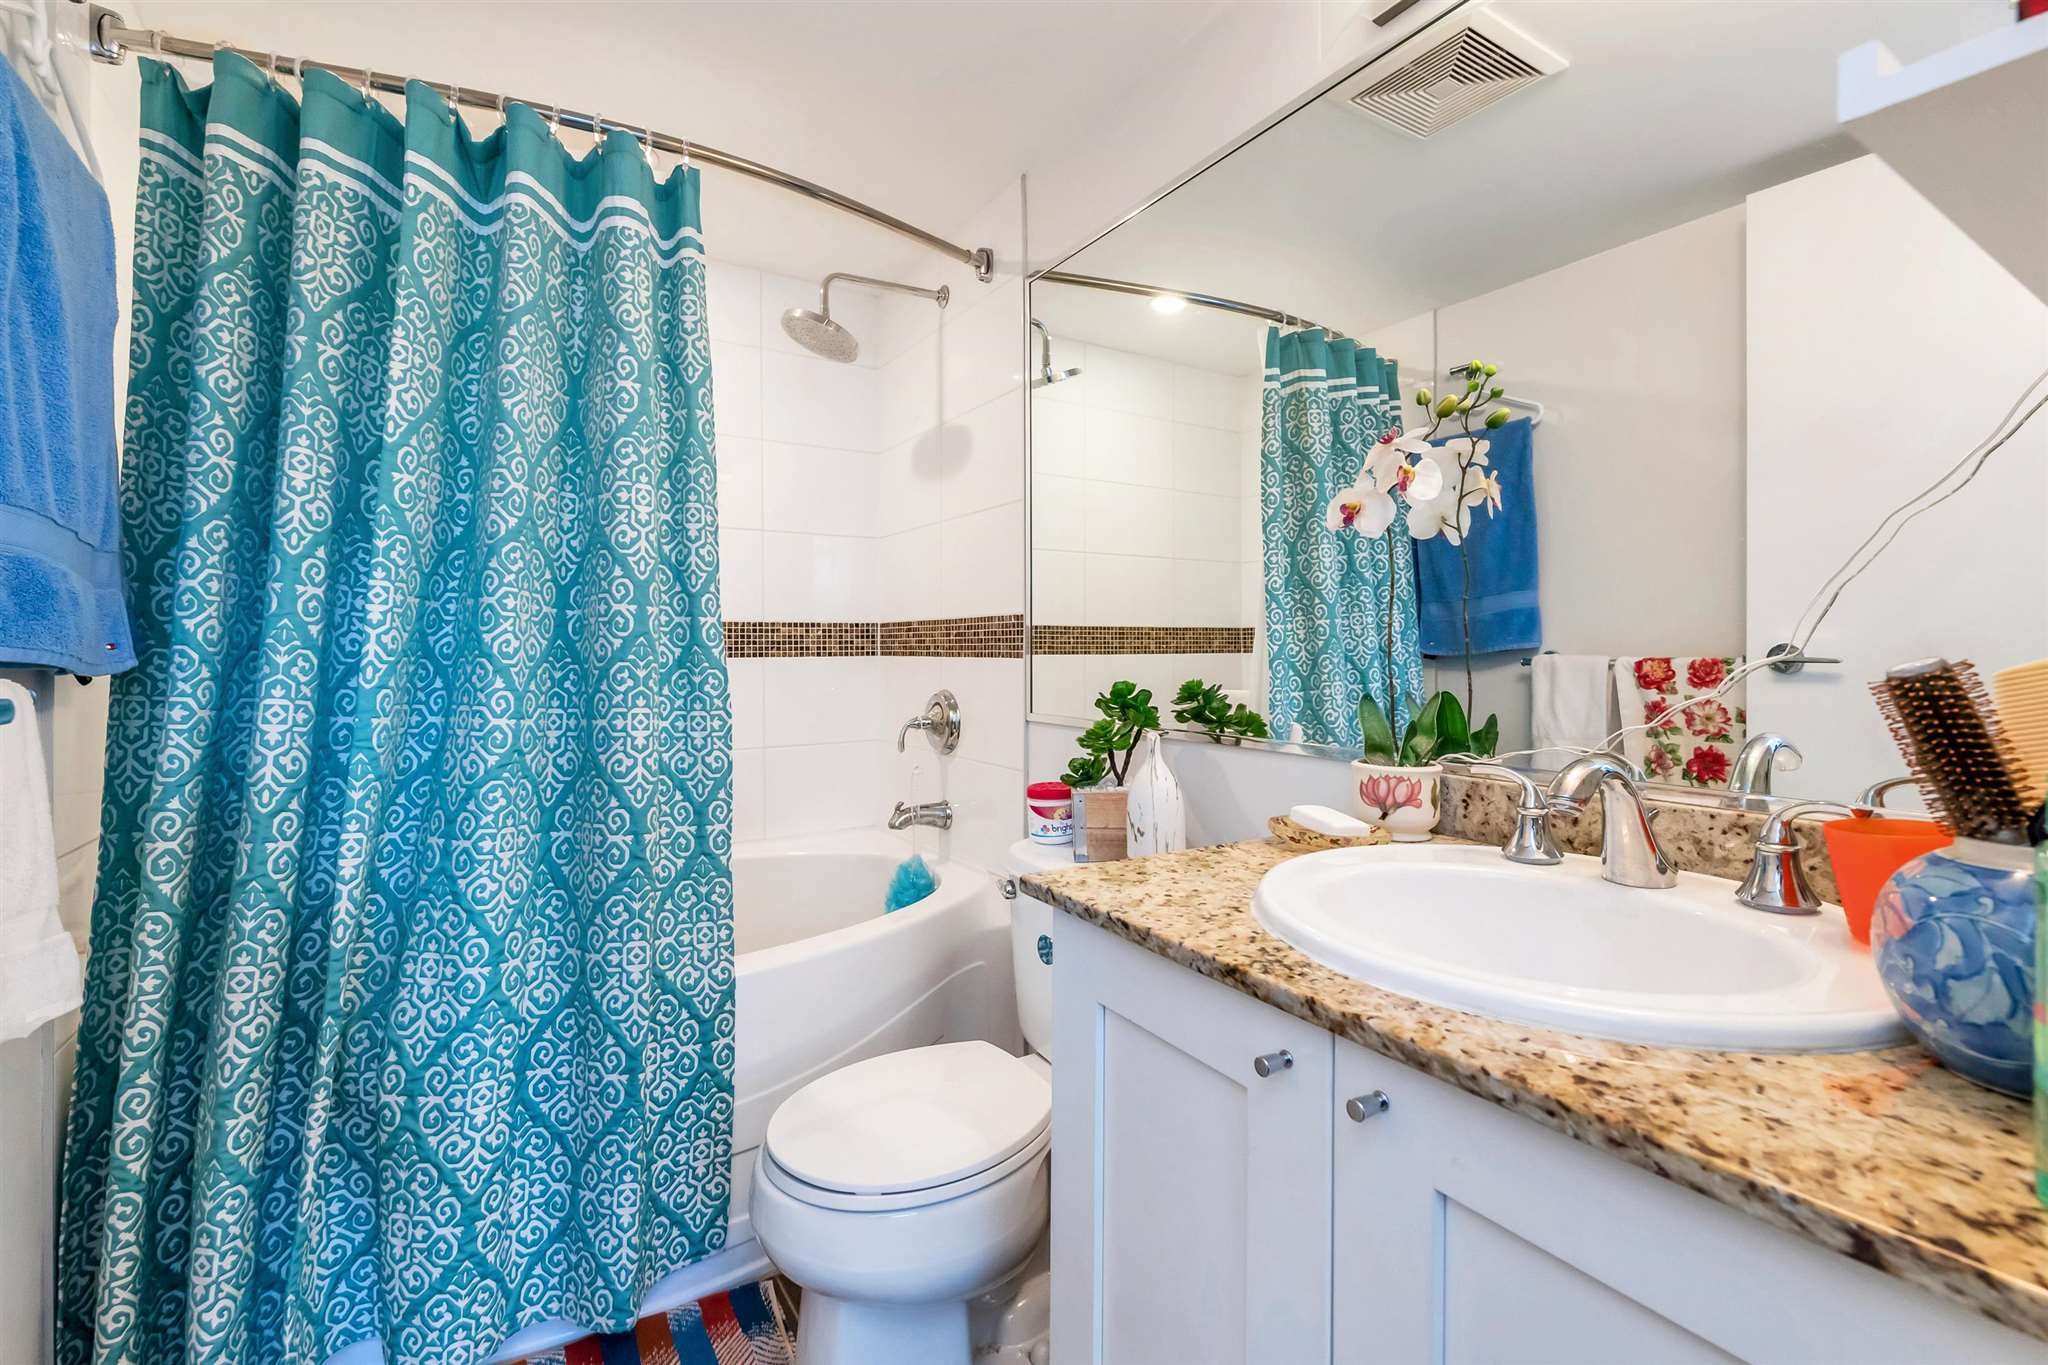 205 7225 ACORN AVENUE - Highgate Apartment/Condo for sale, 2 Bedrooms (R2606454) - #15